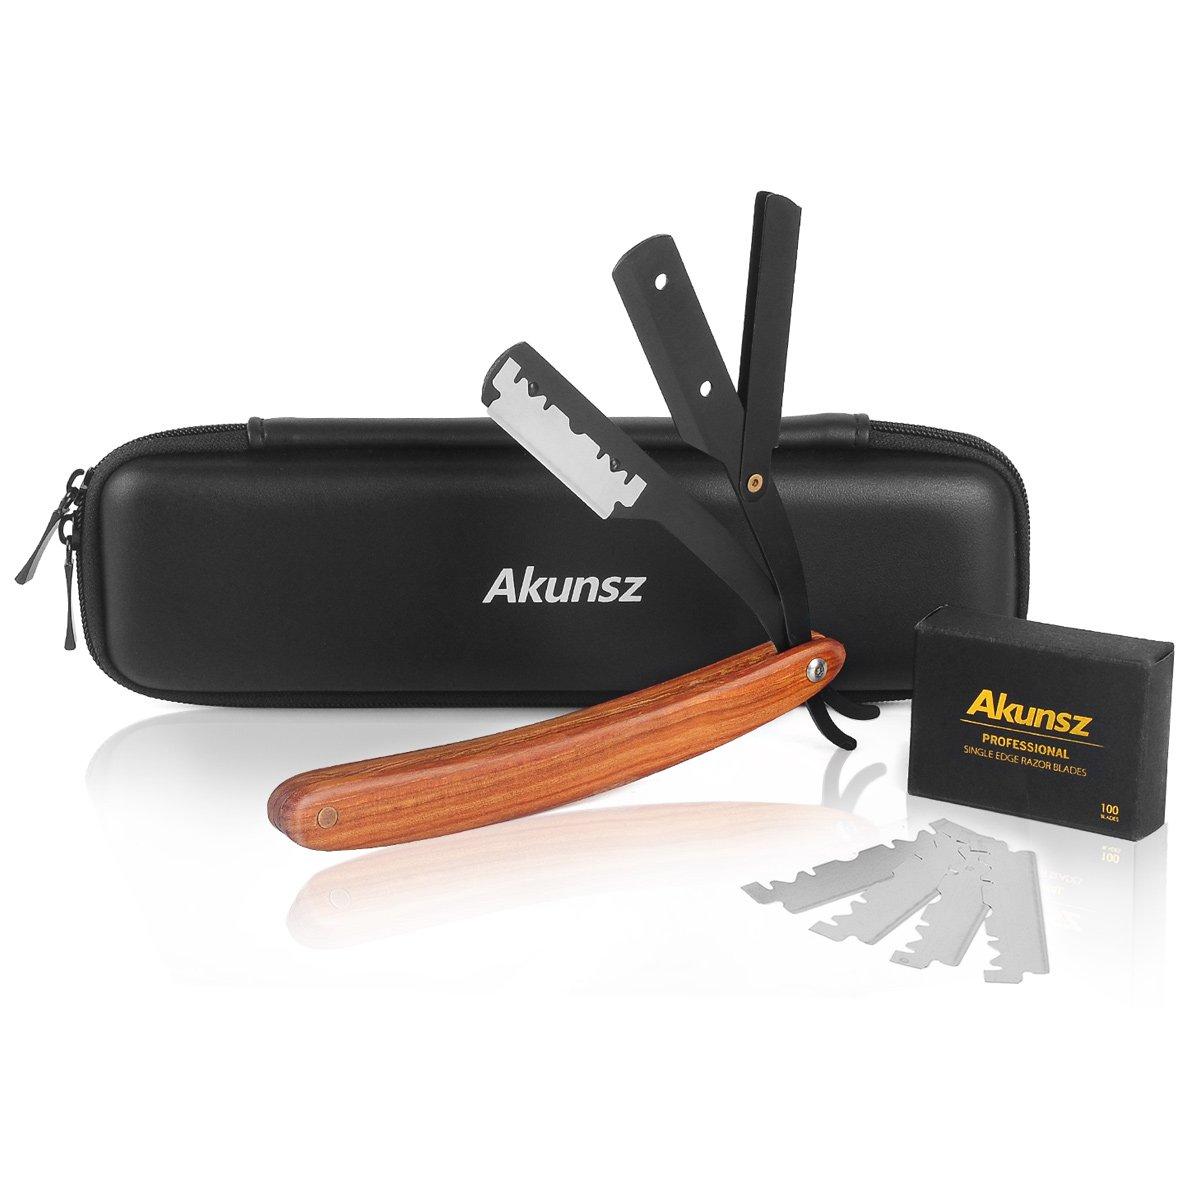 Straight Edge Razor AKUNSZ Professional Black Barber Razor with 100 Single Edge Razor Blades and Barber Straight Razor Case - Rosewood Handle